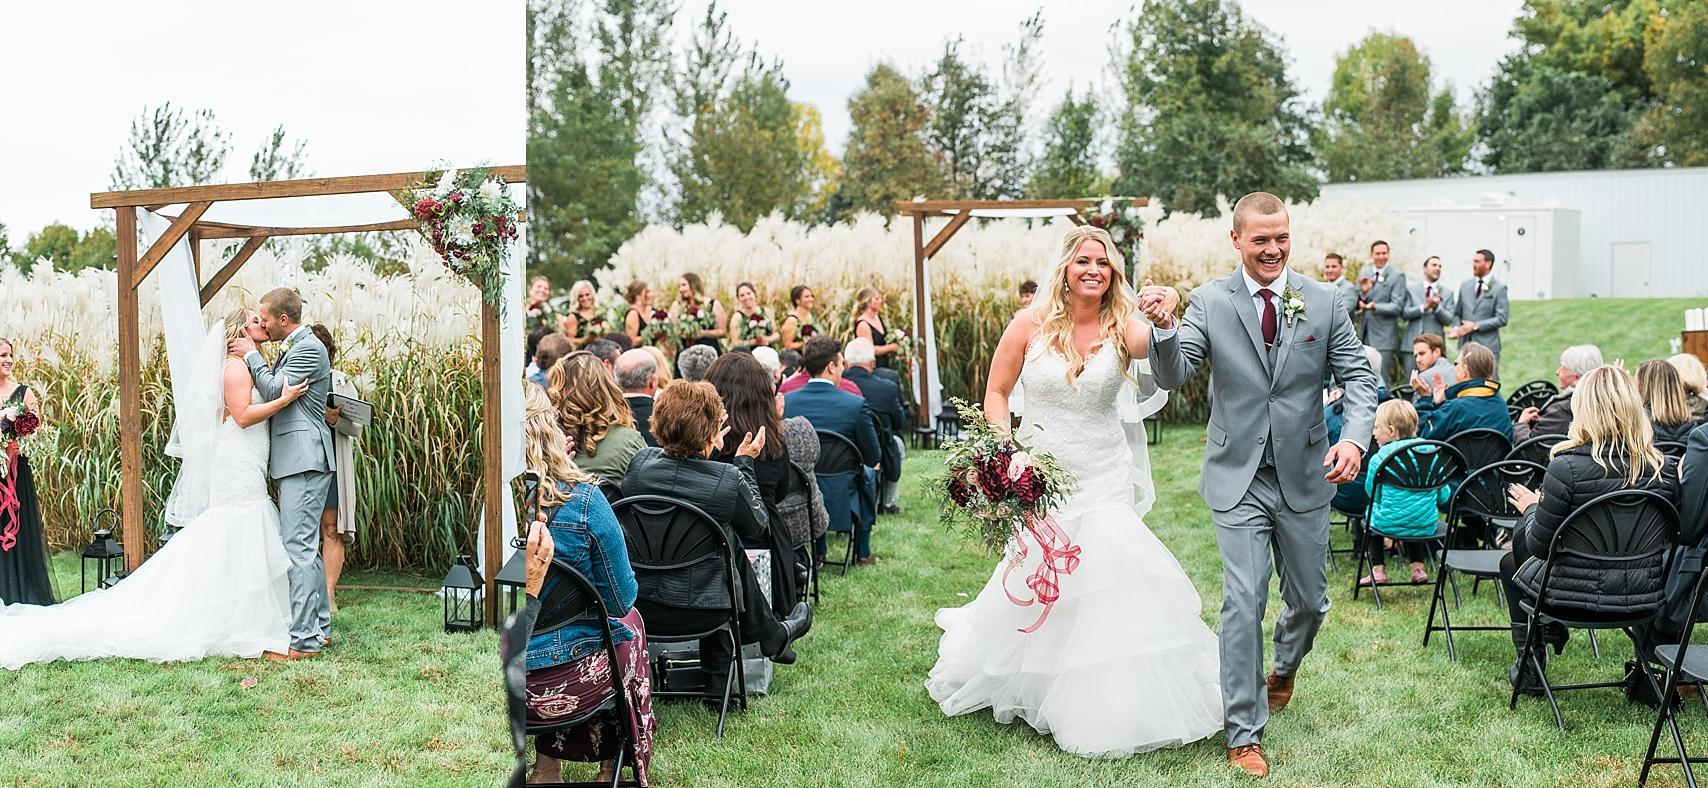 Minnesota Minneapolis Wedding Photographer Best Of 2018 Weddings Mallory Kiesow Photography_0206.jpg